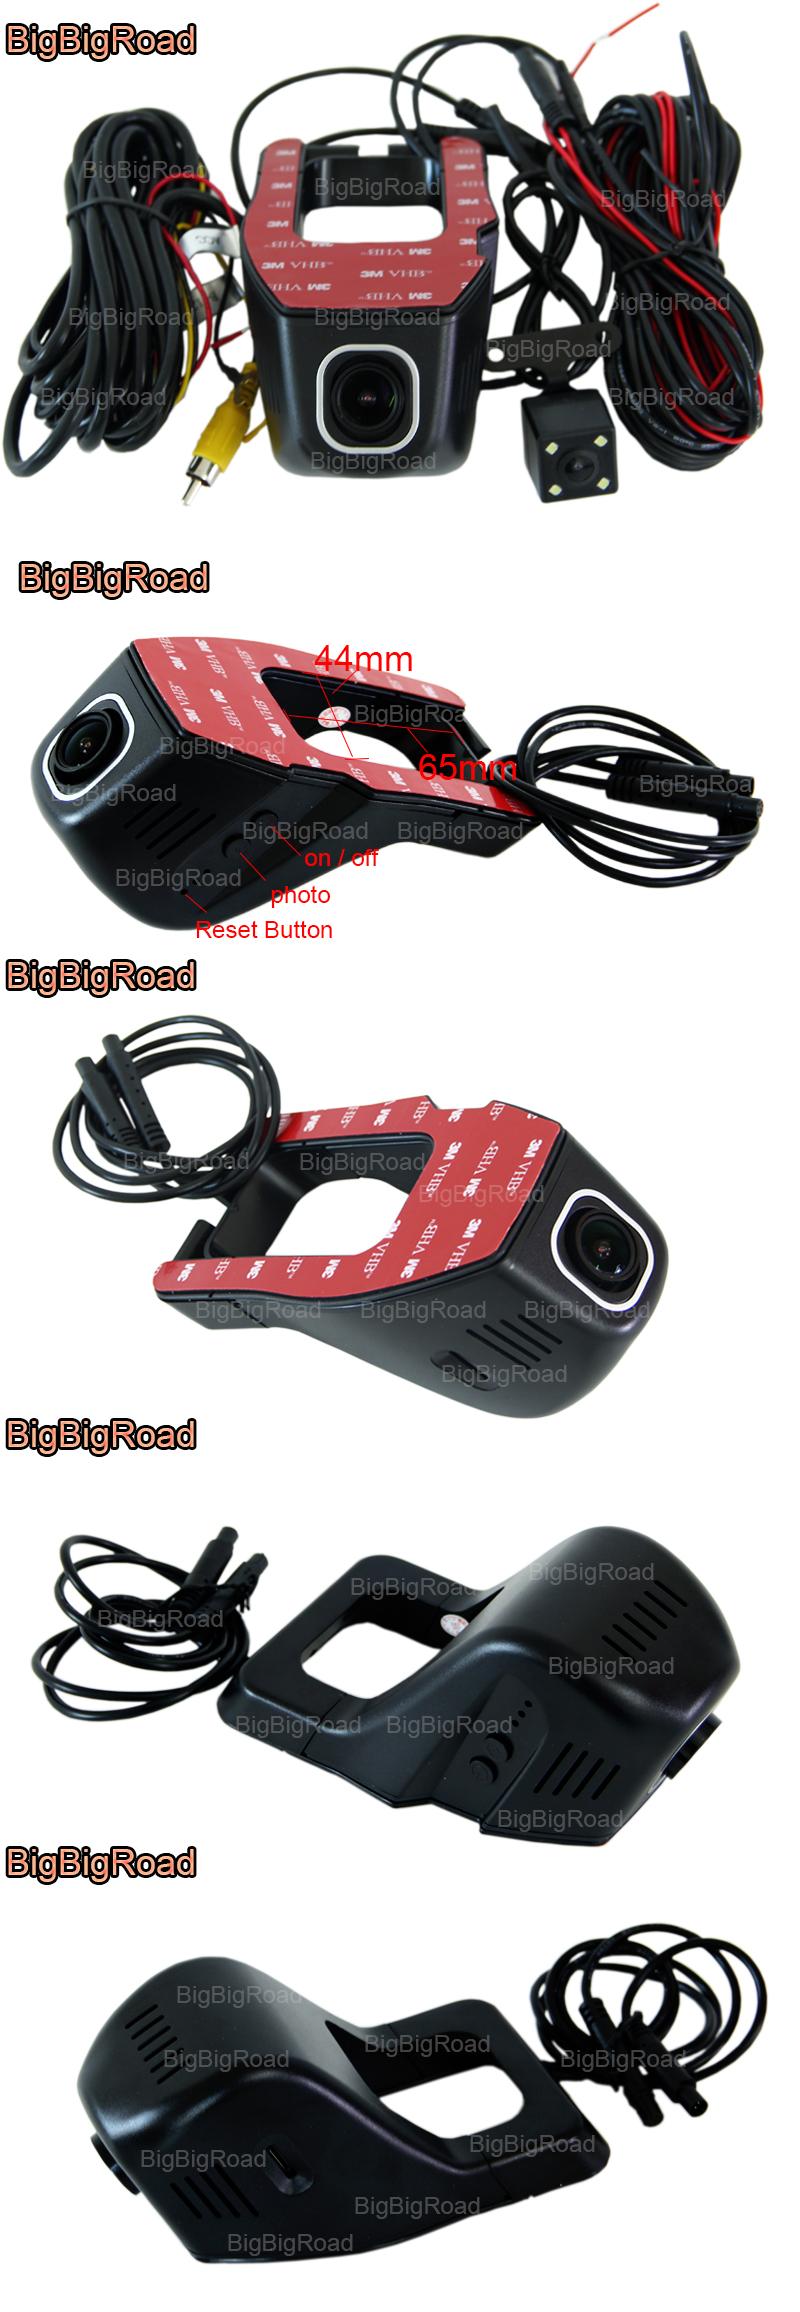 BigBigRoad Car Wifi DVR For honda accord CR-Z GREIZ CRV CR-V Jade odyssey elysion Dual Camera Video Recorder Dash Cam Black Box (11)